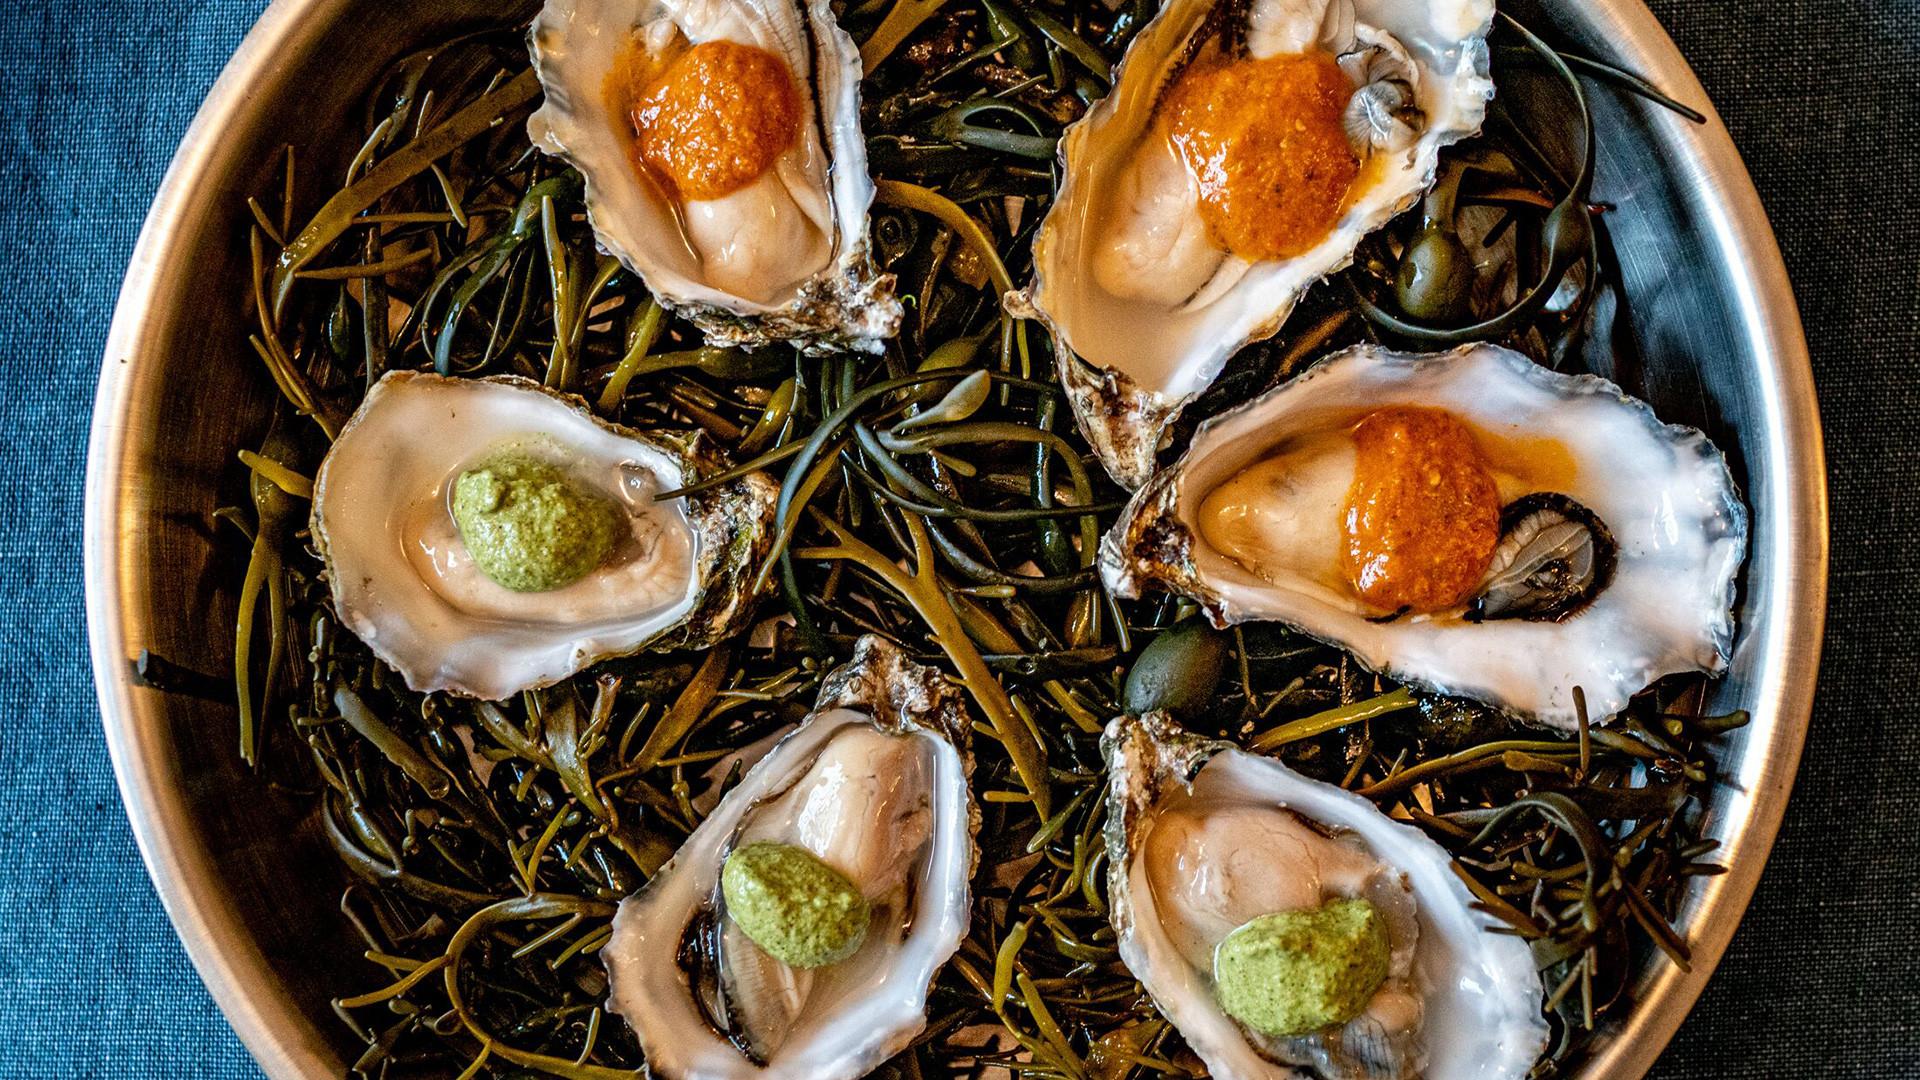 Lyon's Seafood & Wine Bar